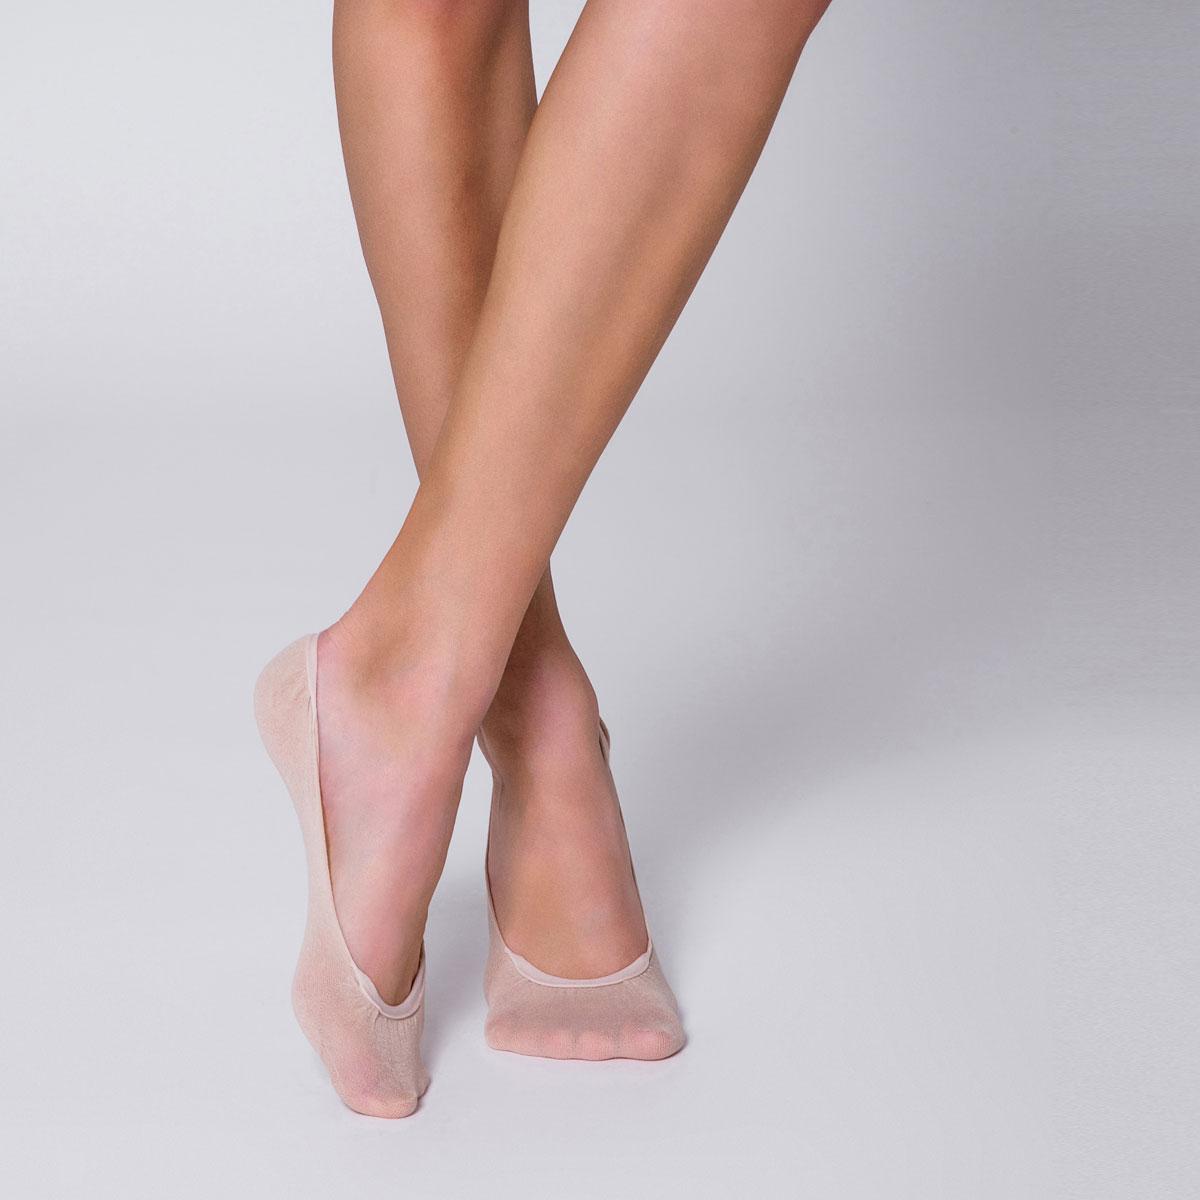 Protège-pied naturels spécial ballerine en silicone